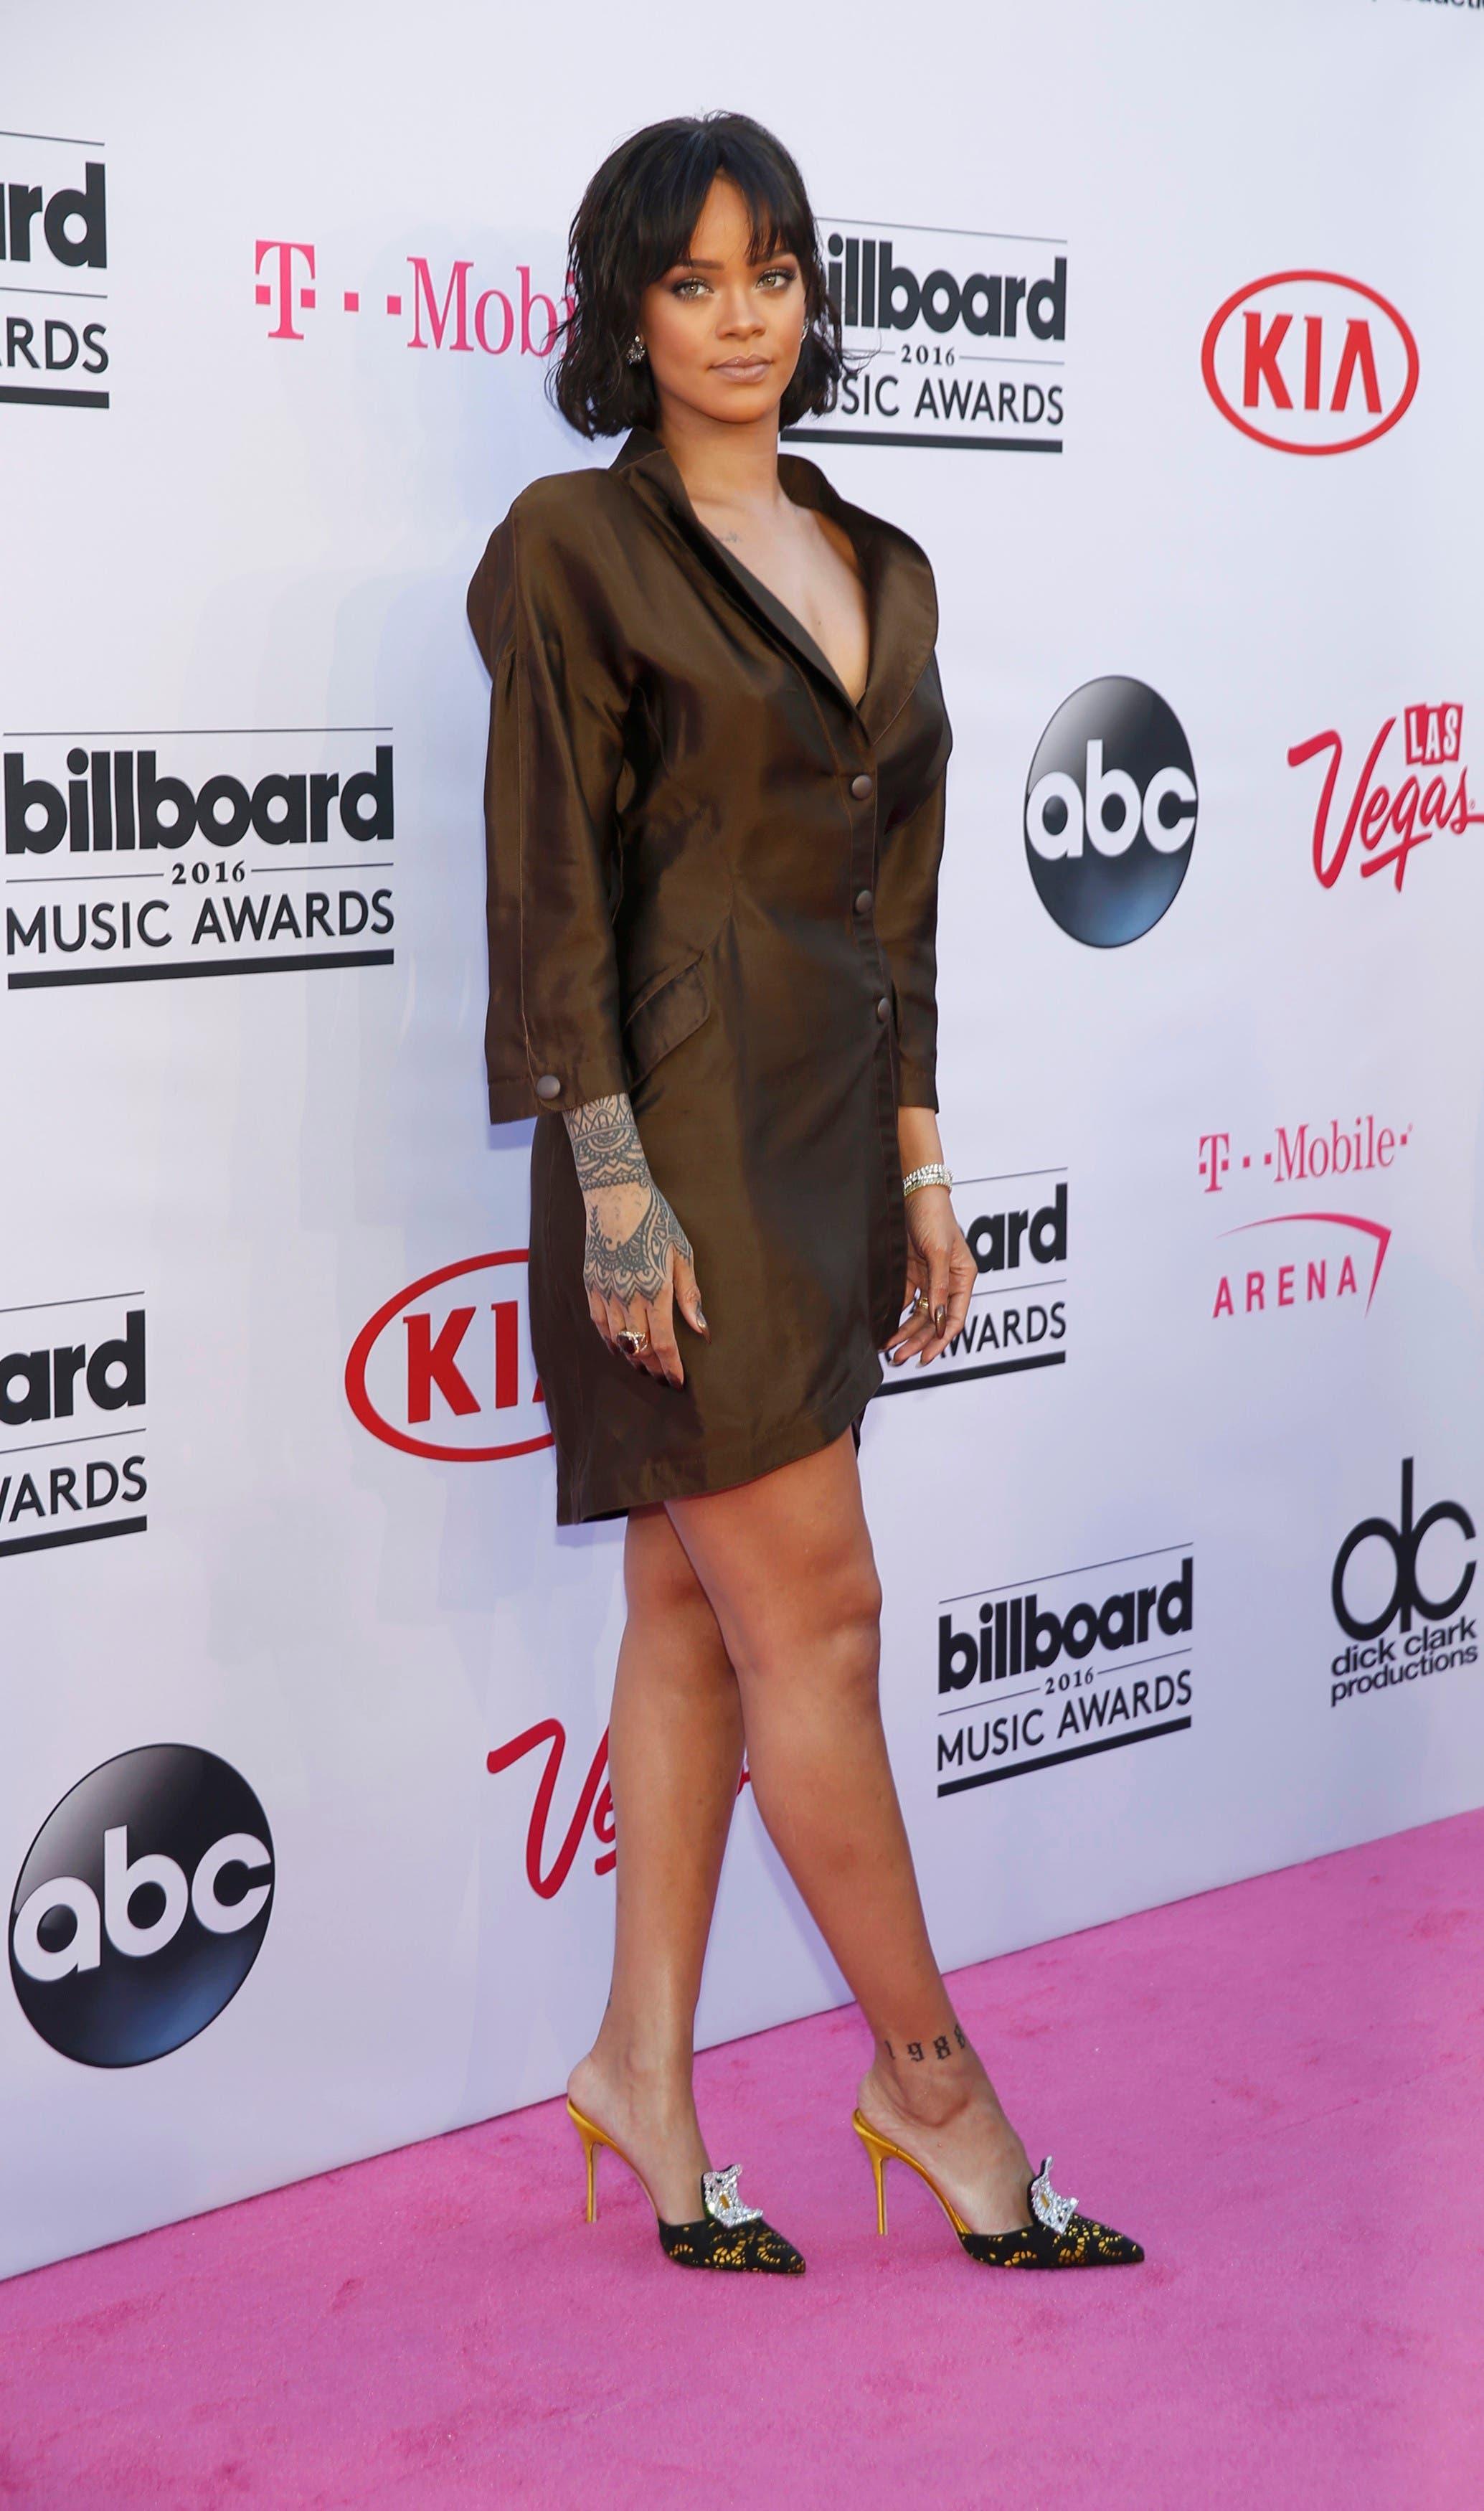 Singer Rihanna arrives at the 2016 Billboard Awards in Las Vegas, Nevada, US, May 22, 2016.  (Reuters)